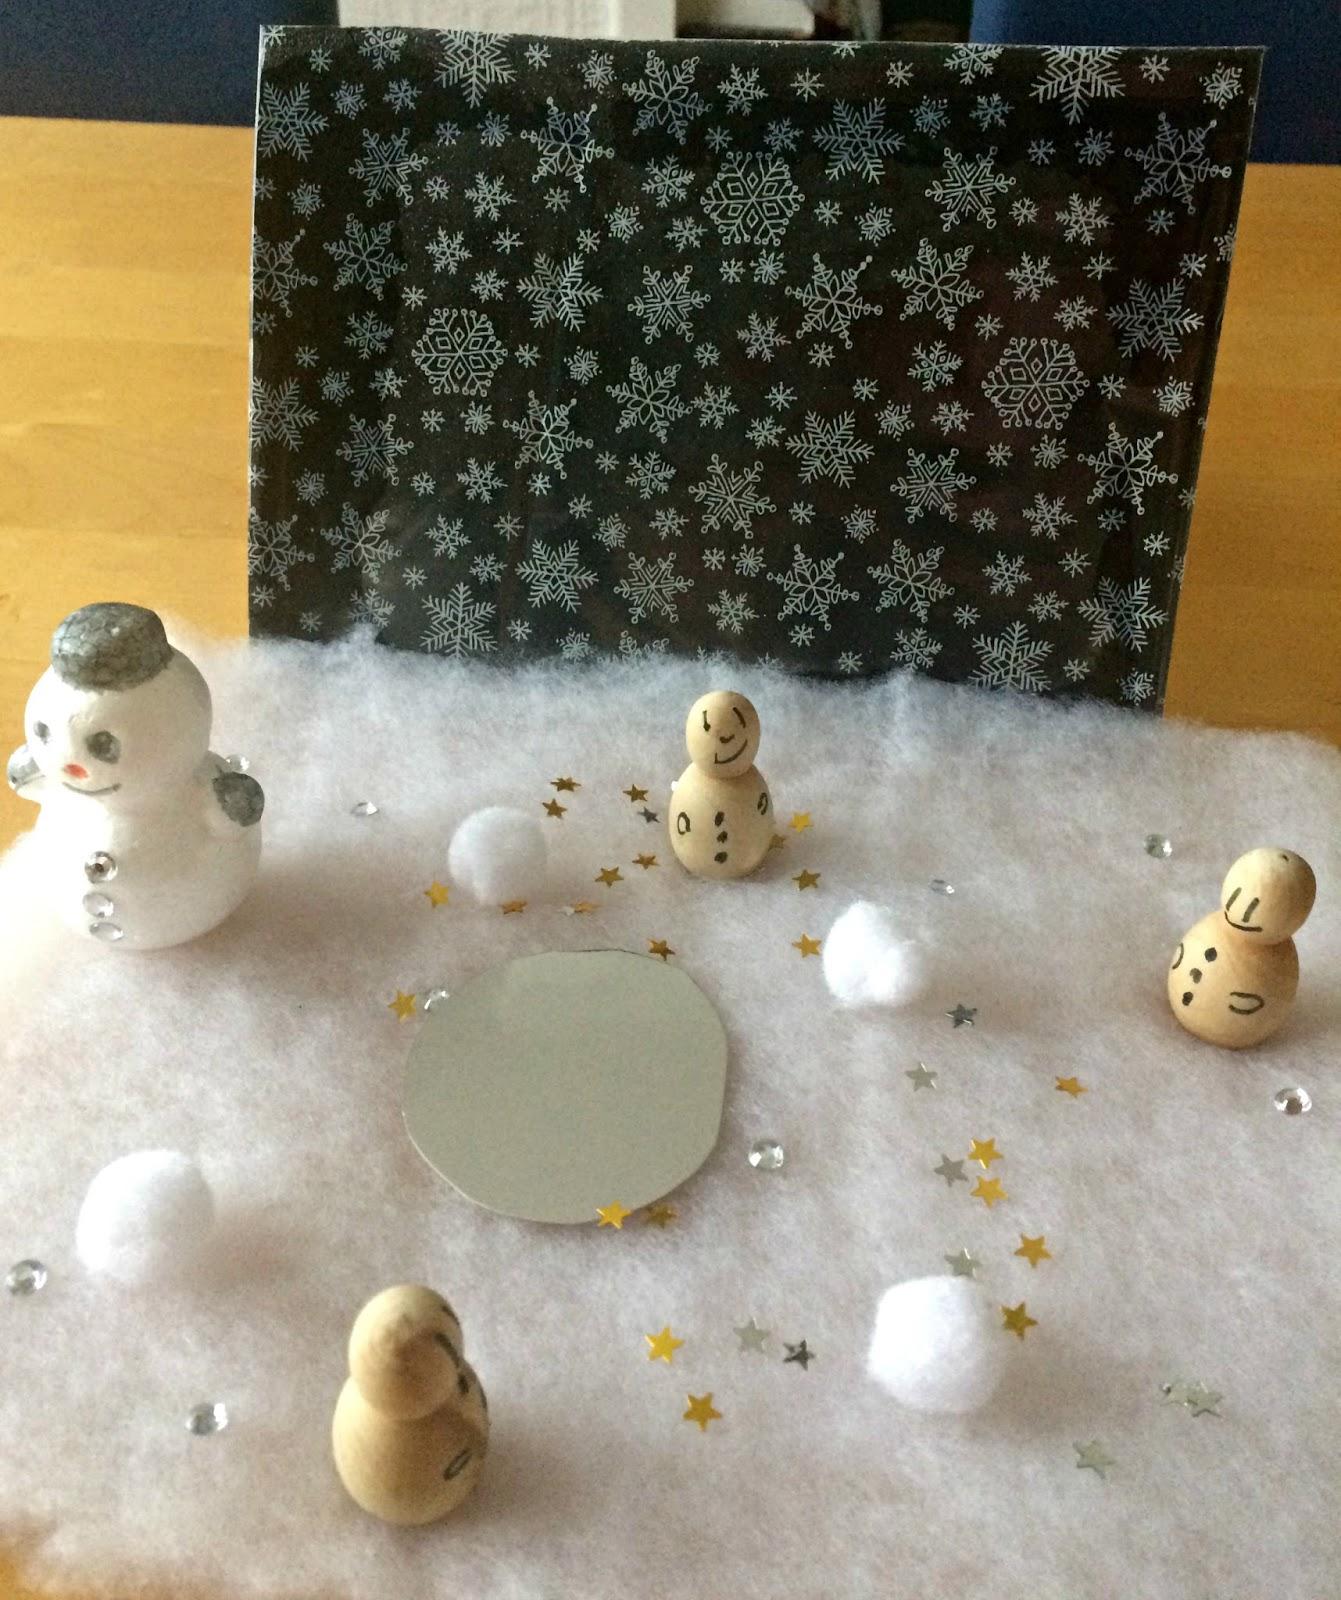 The final snow scene